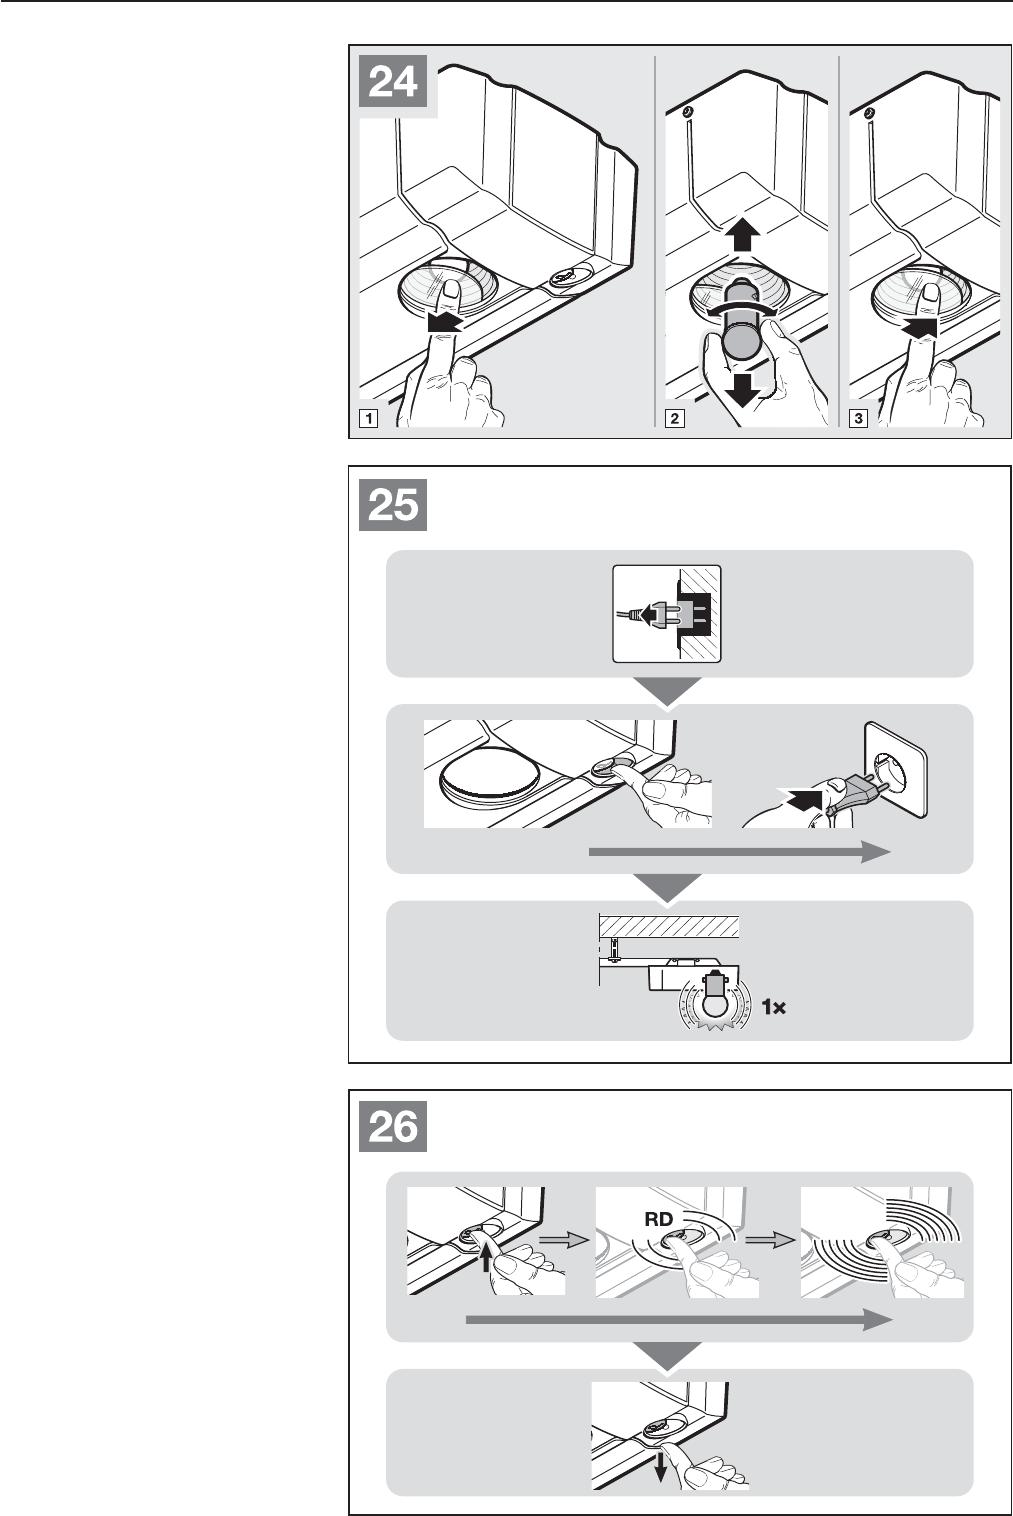 h rmann promatic 3 externe beleuchtung dekoration bild idee. Black Bedroom Furniture Sets. Home Design Ideas